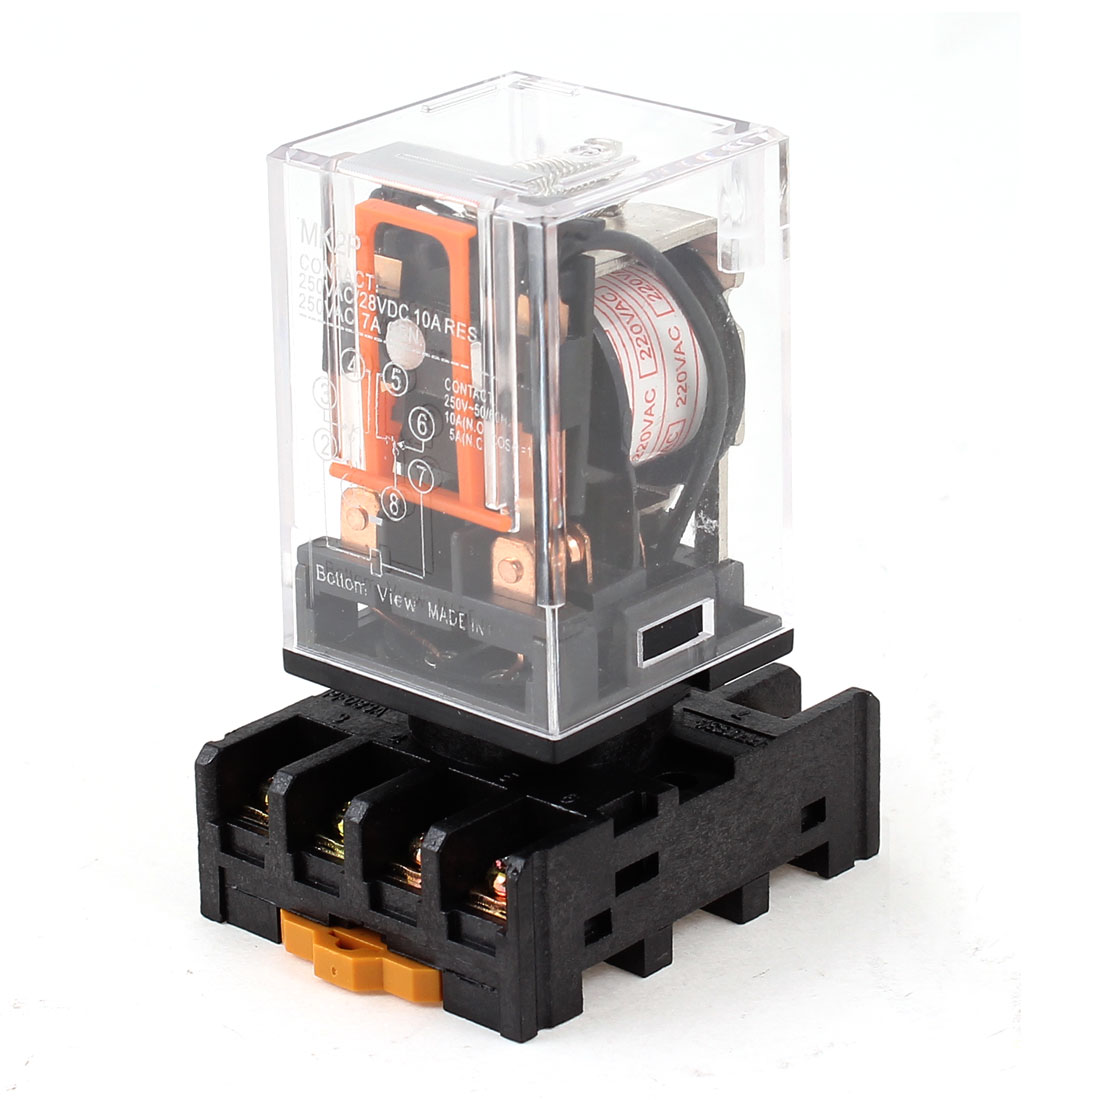 MK2P AC 220V 8 Pins DPDT Coil Power Relay w Base Socket